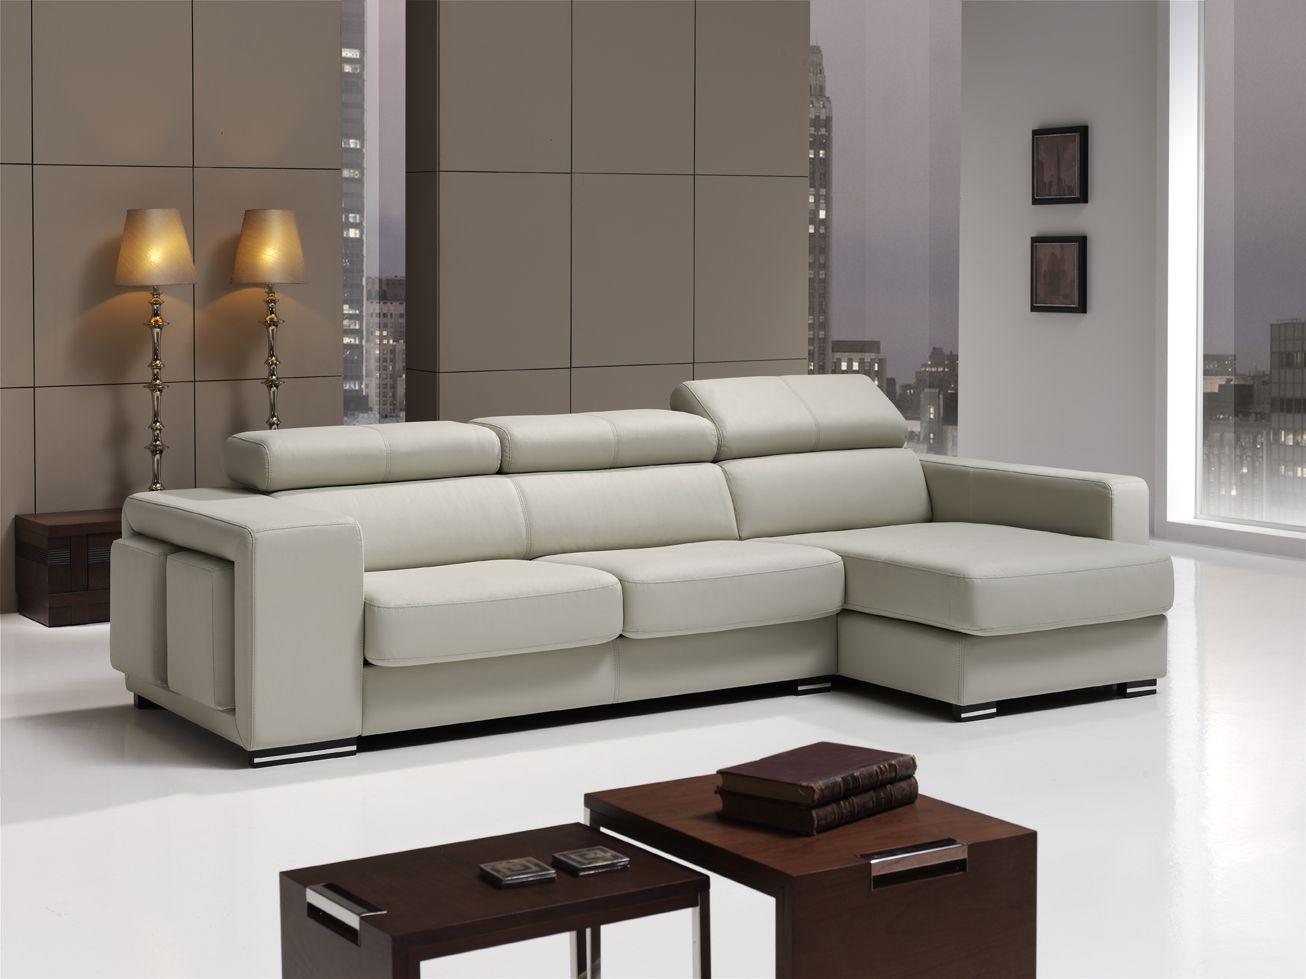 Tienda muebles tienda dise o tienda decoraci n tienda - Sofas diseno valencia ...